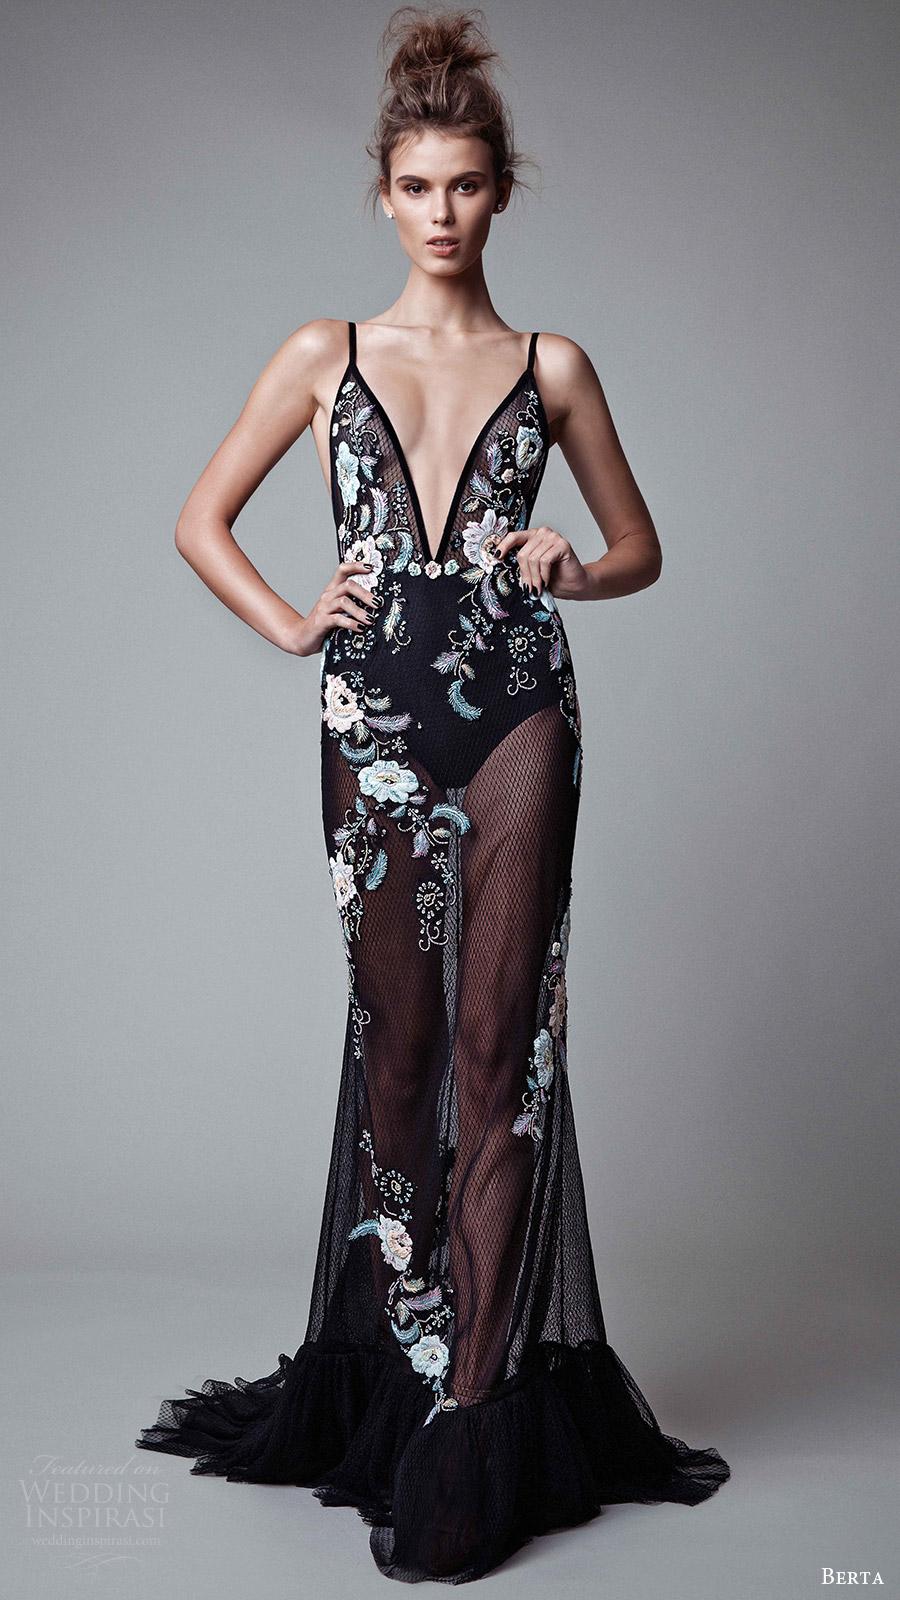 berta rtw fall 2017 (17 22) sleeveless deep v neck embroidered black trumpet evening dress mv sheer skirt